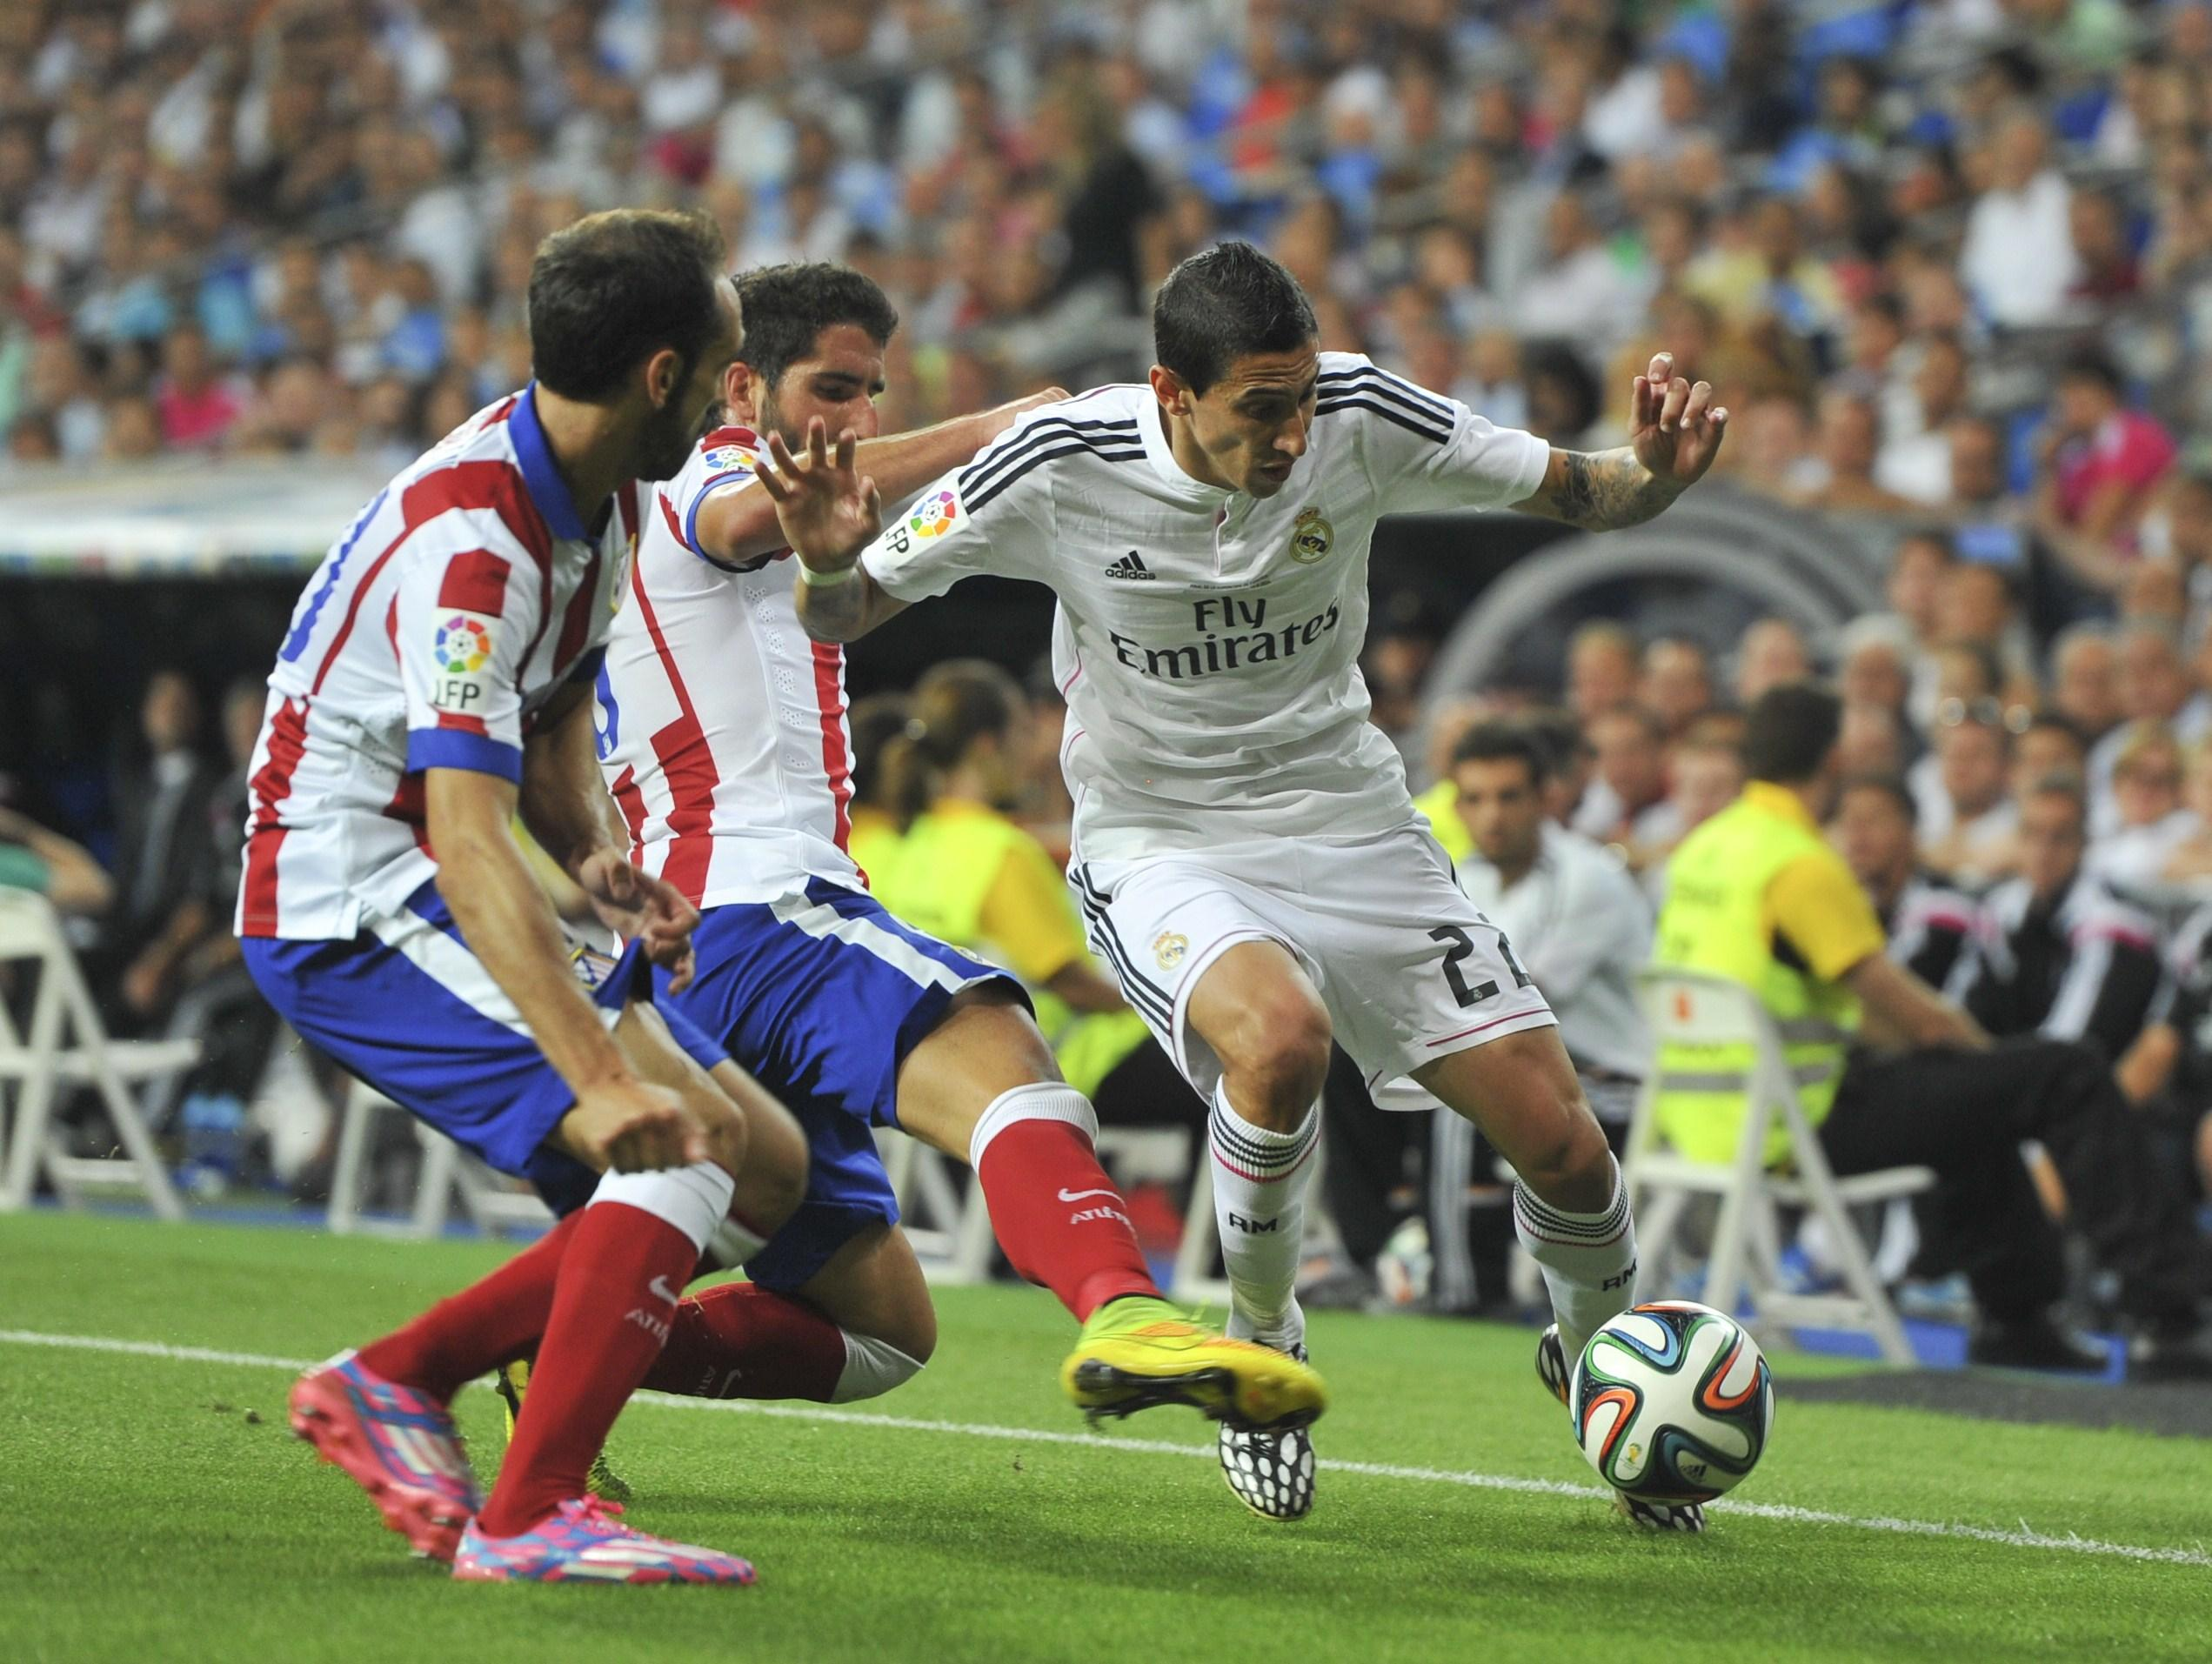 Di Maria tore Atletico to shreds in 2014